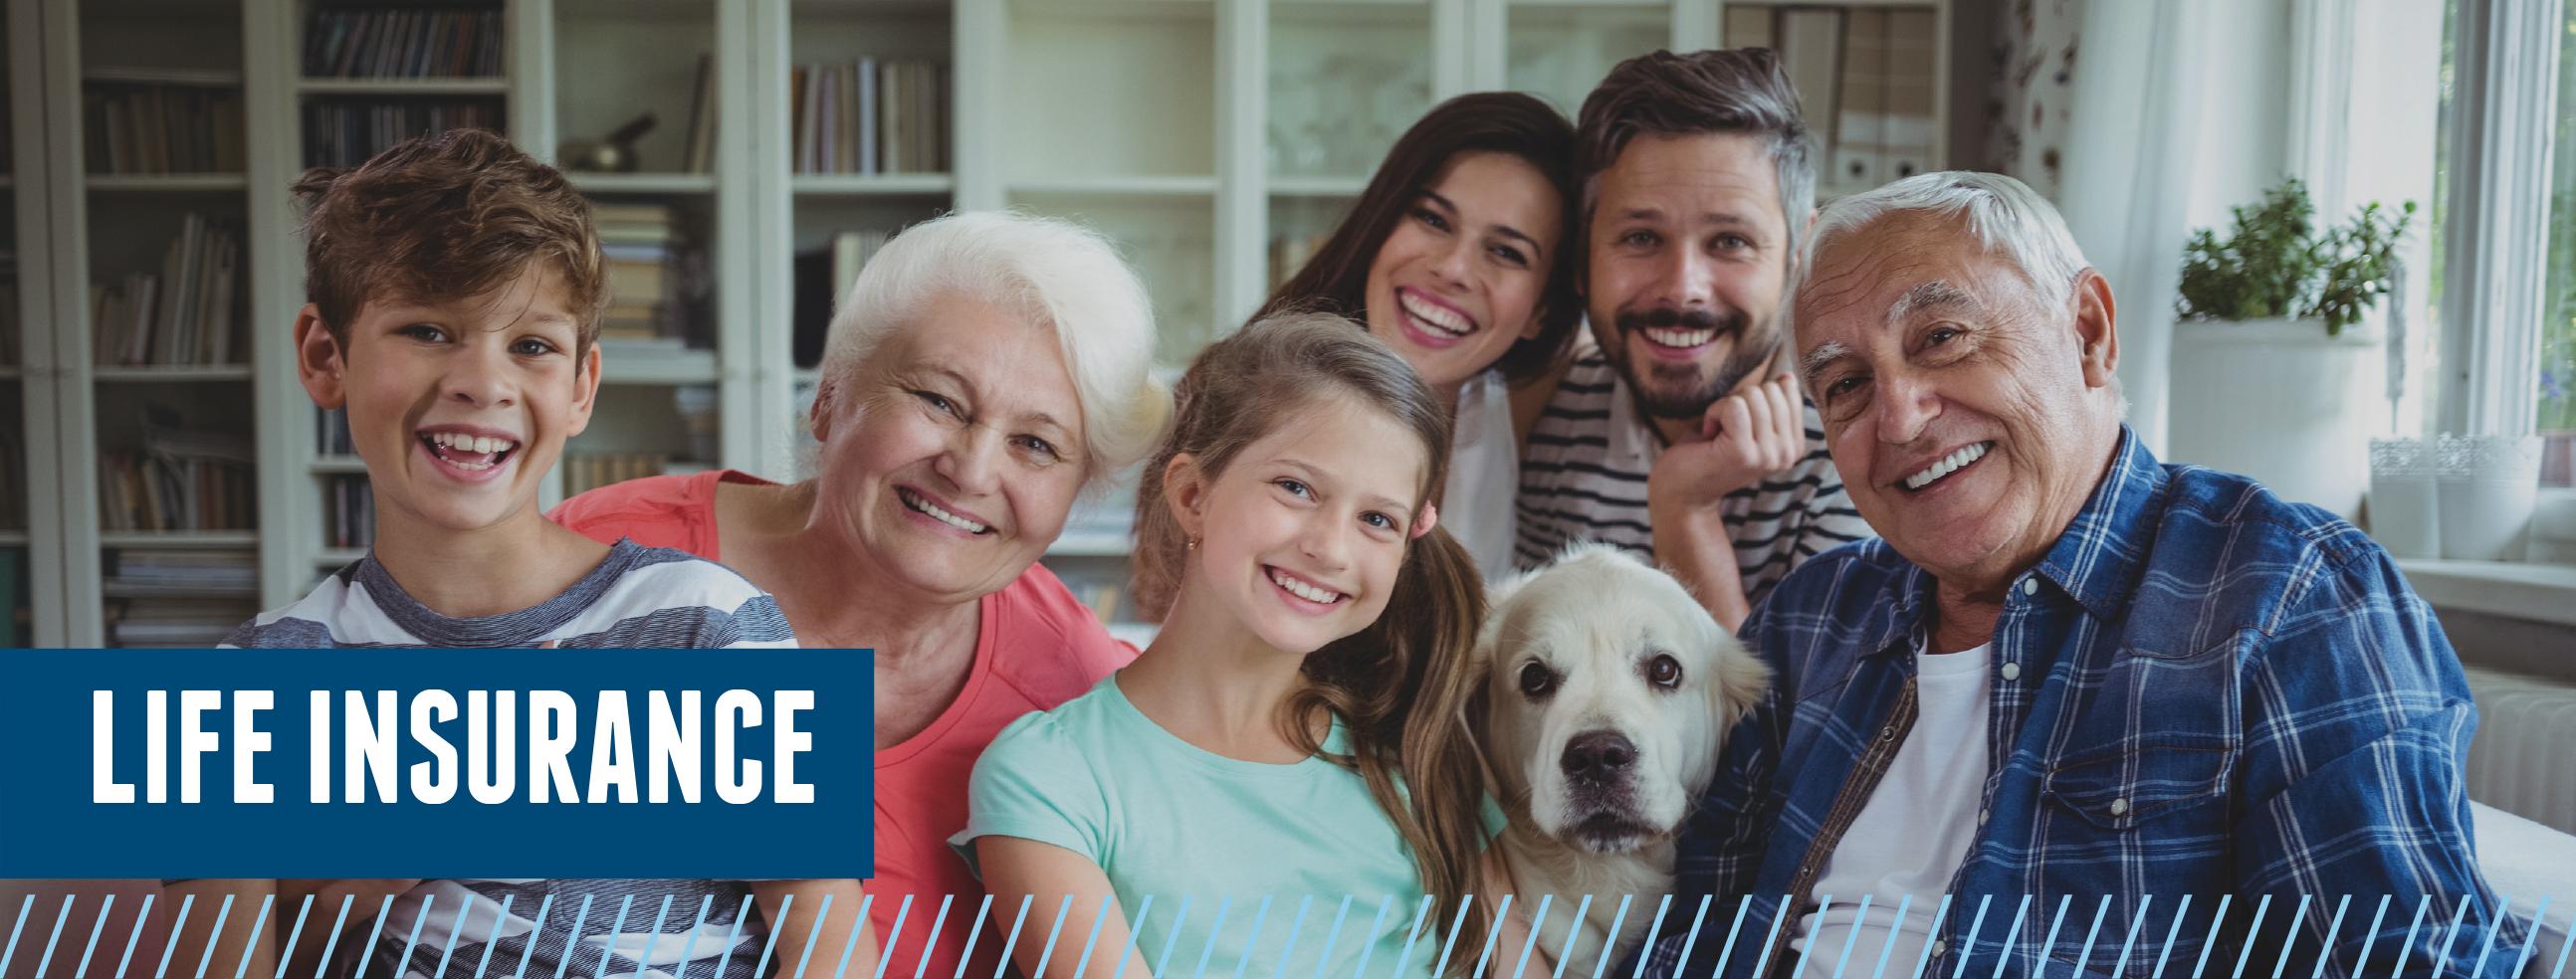 4KIDS Life Insurance